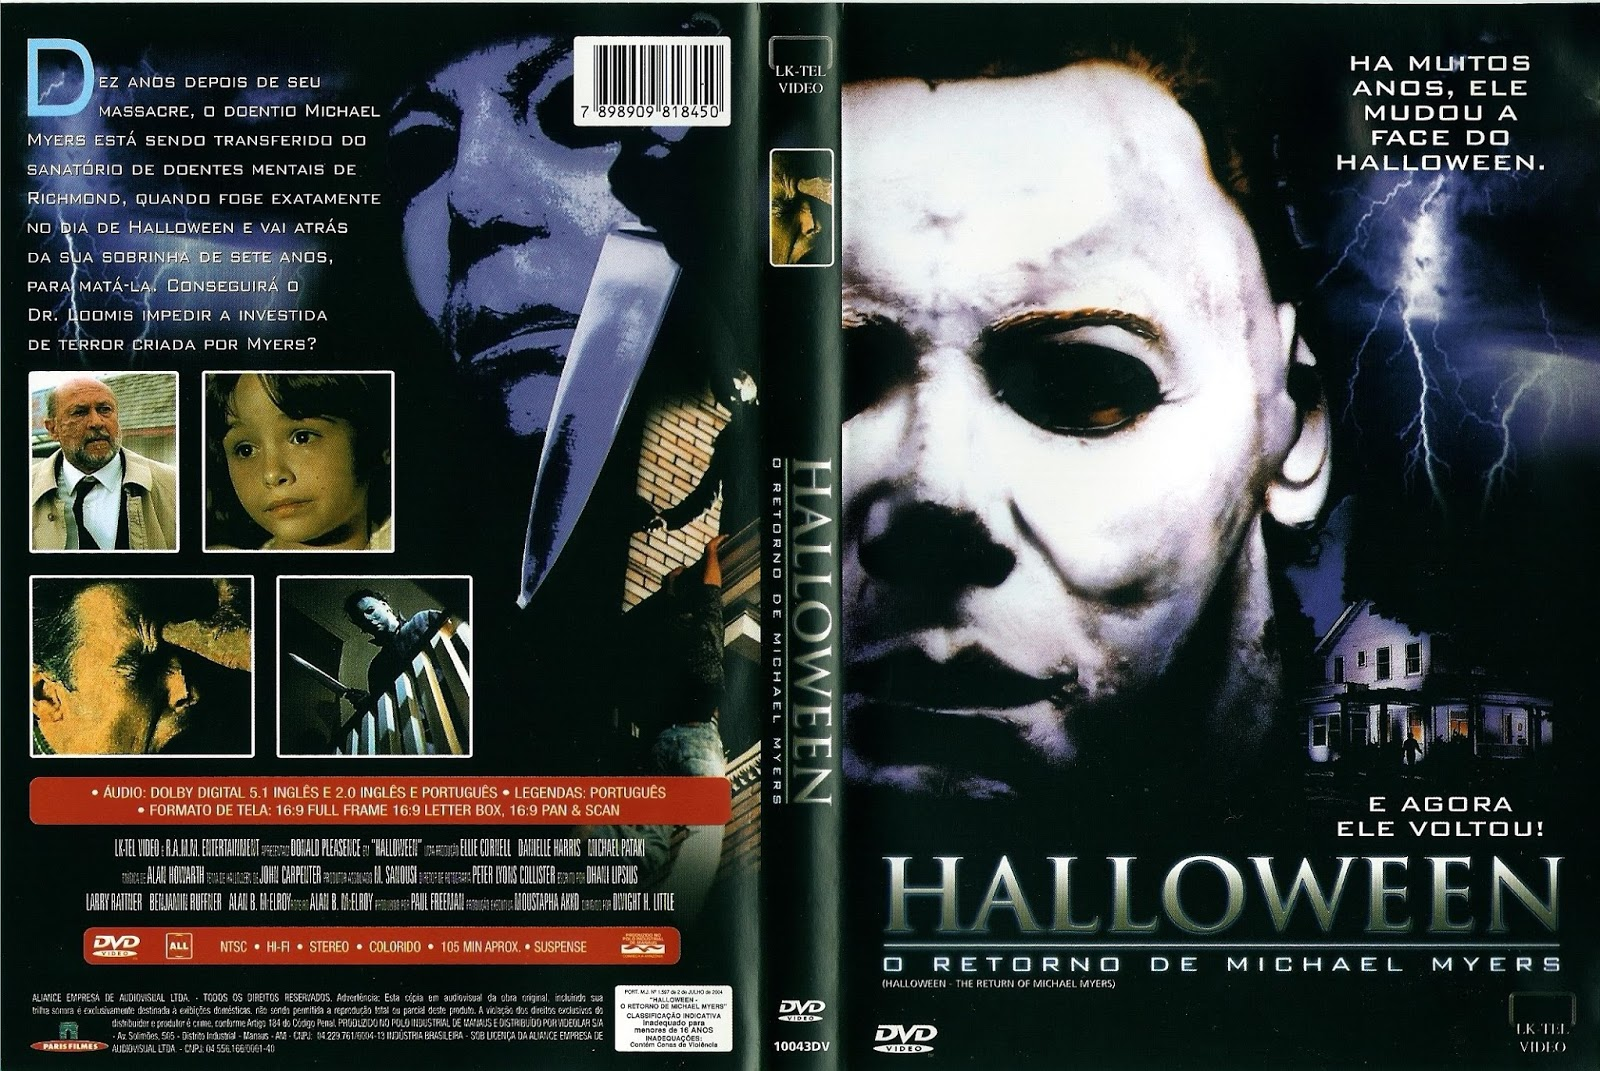 halloween ii vhs cover